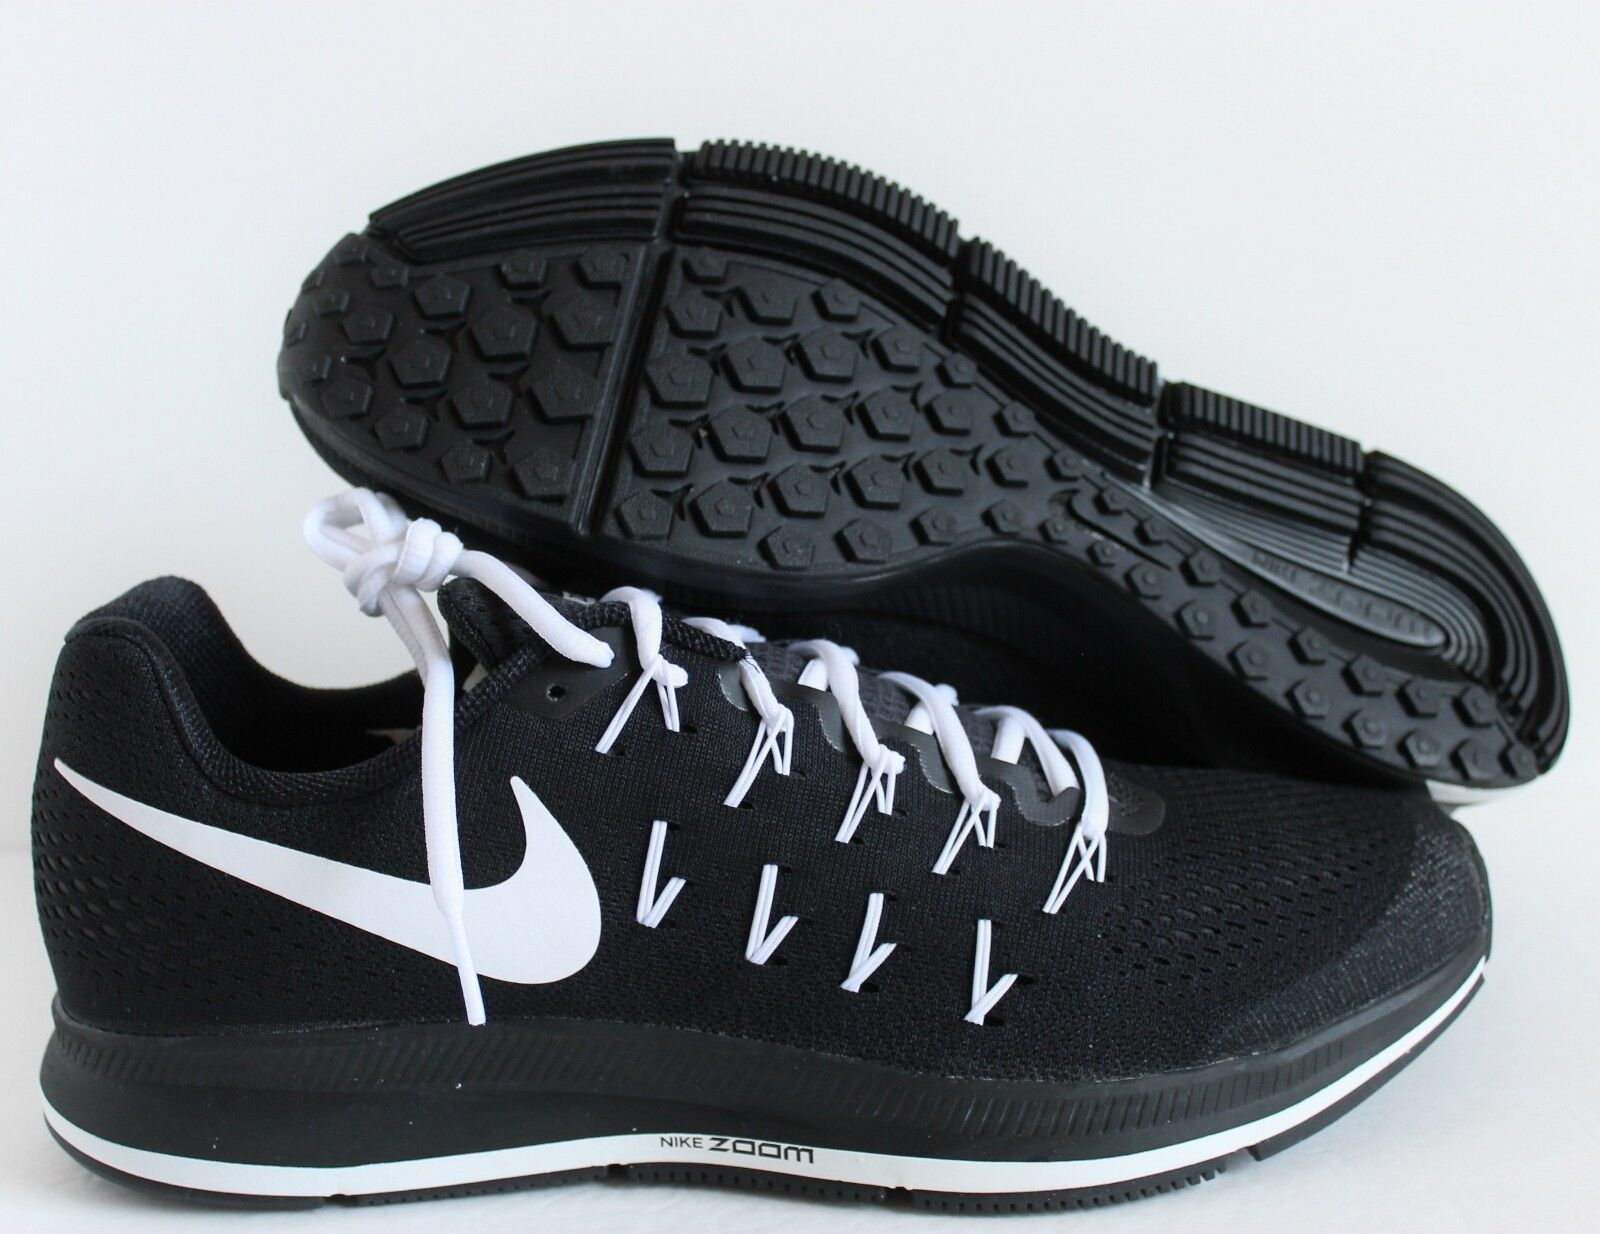 Nike Men Zoom Pegasus 33 iD Blue-White Price reduction  Cheap and beautiful fashion